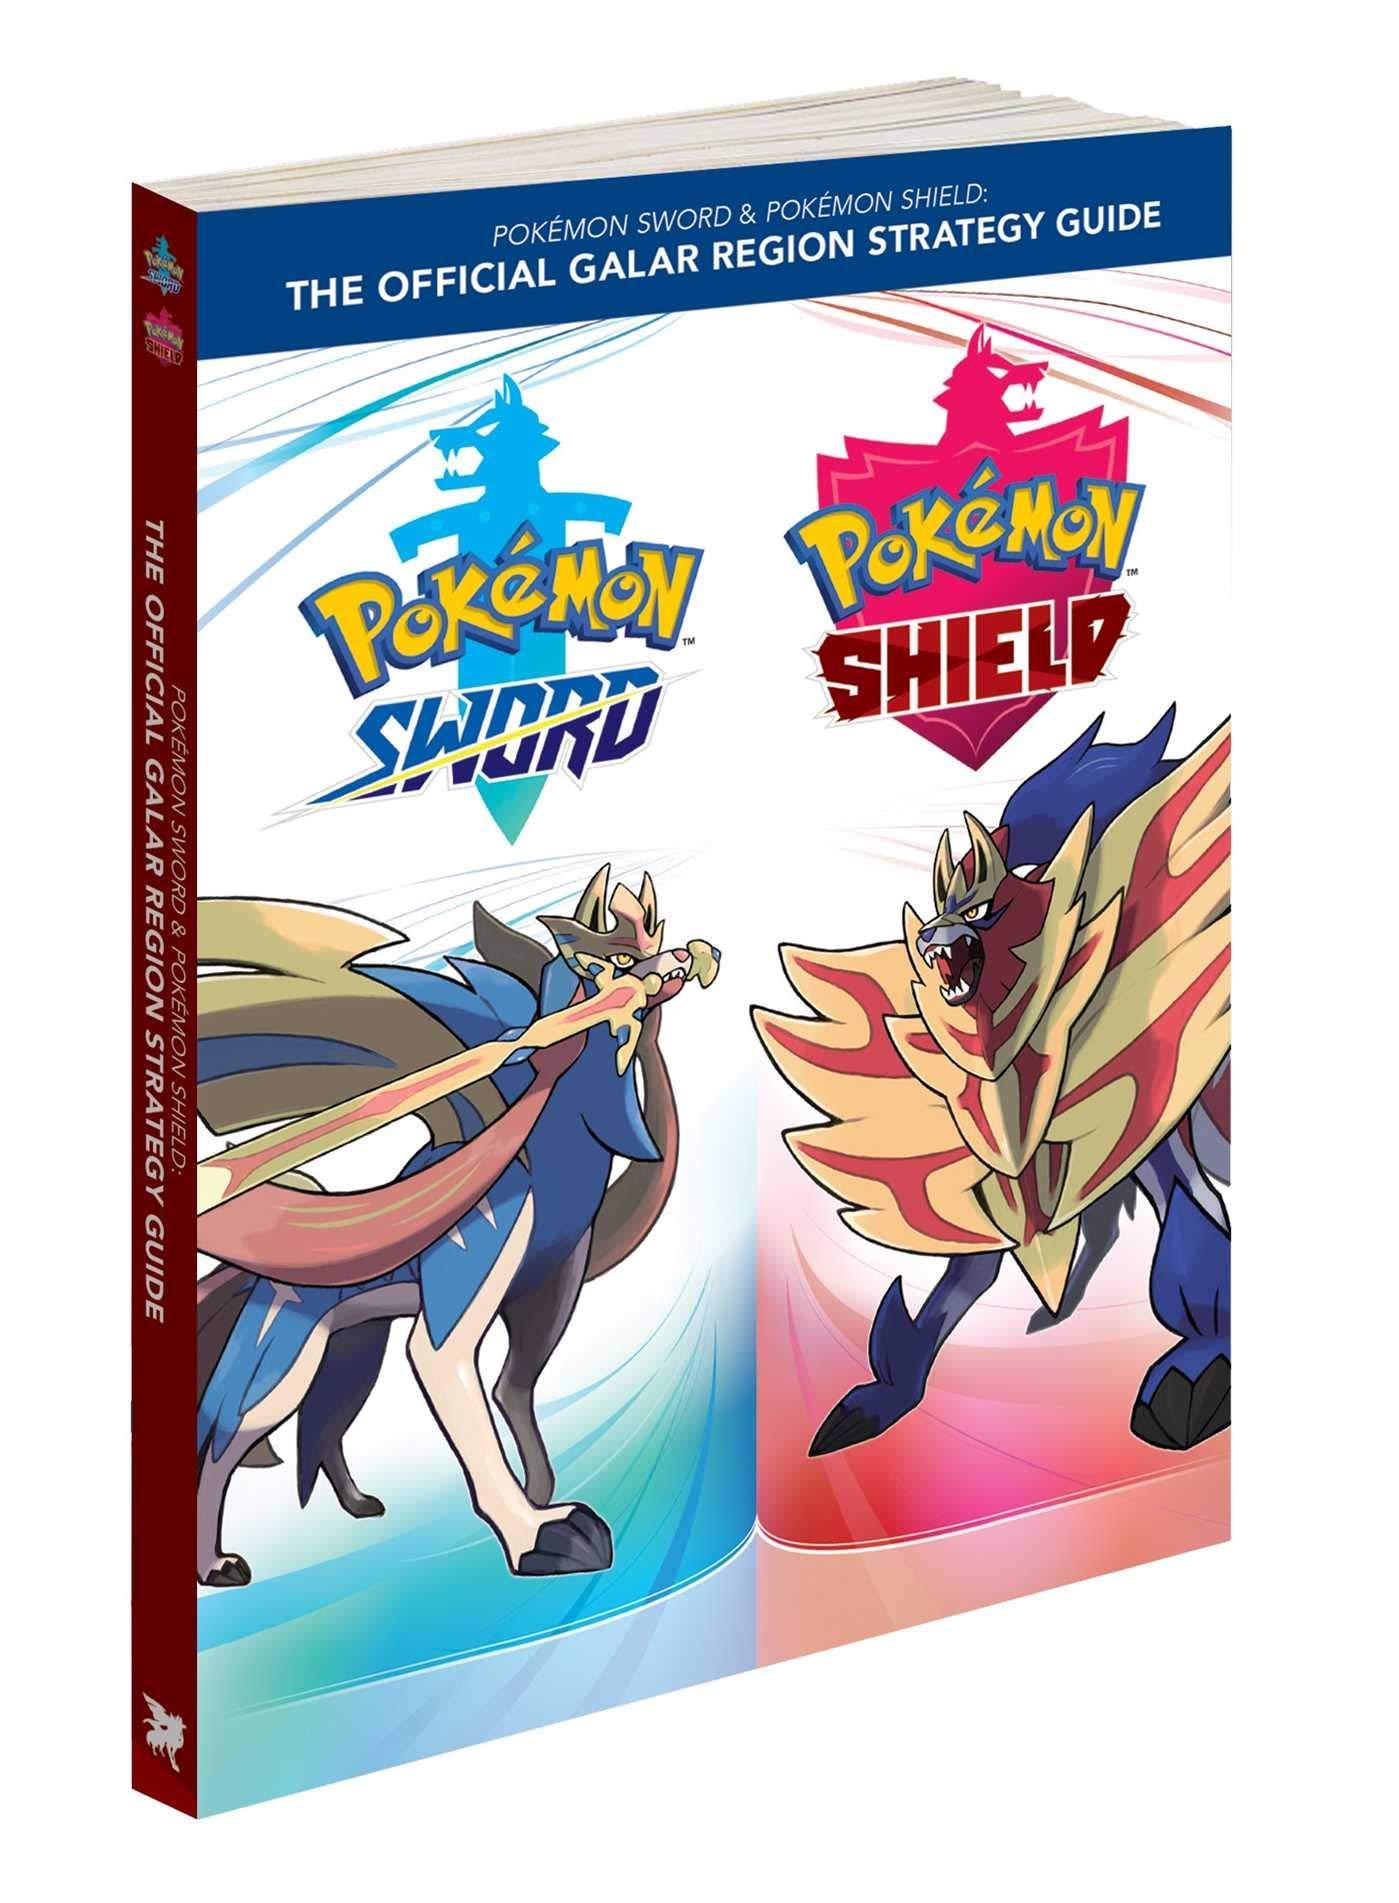 Pokémon Sword & Shield Strategy Guide (Paperback) $15.66